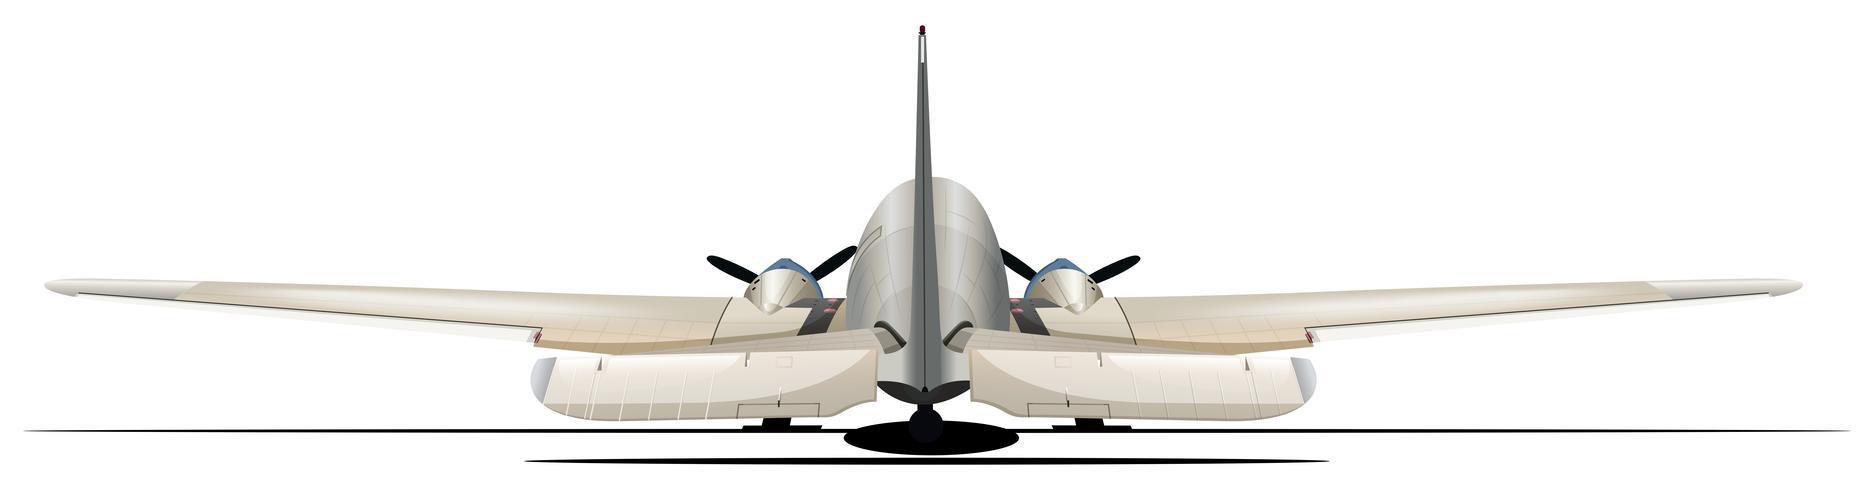 Flugzeug aus der Rückansicht vektor